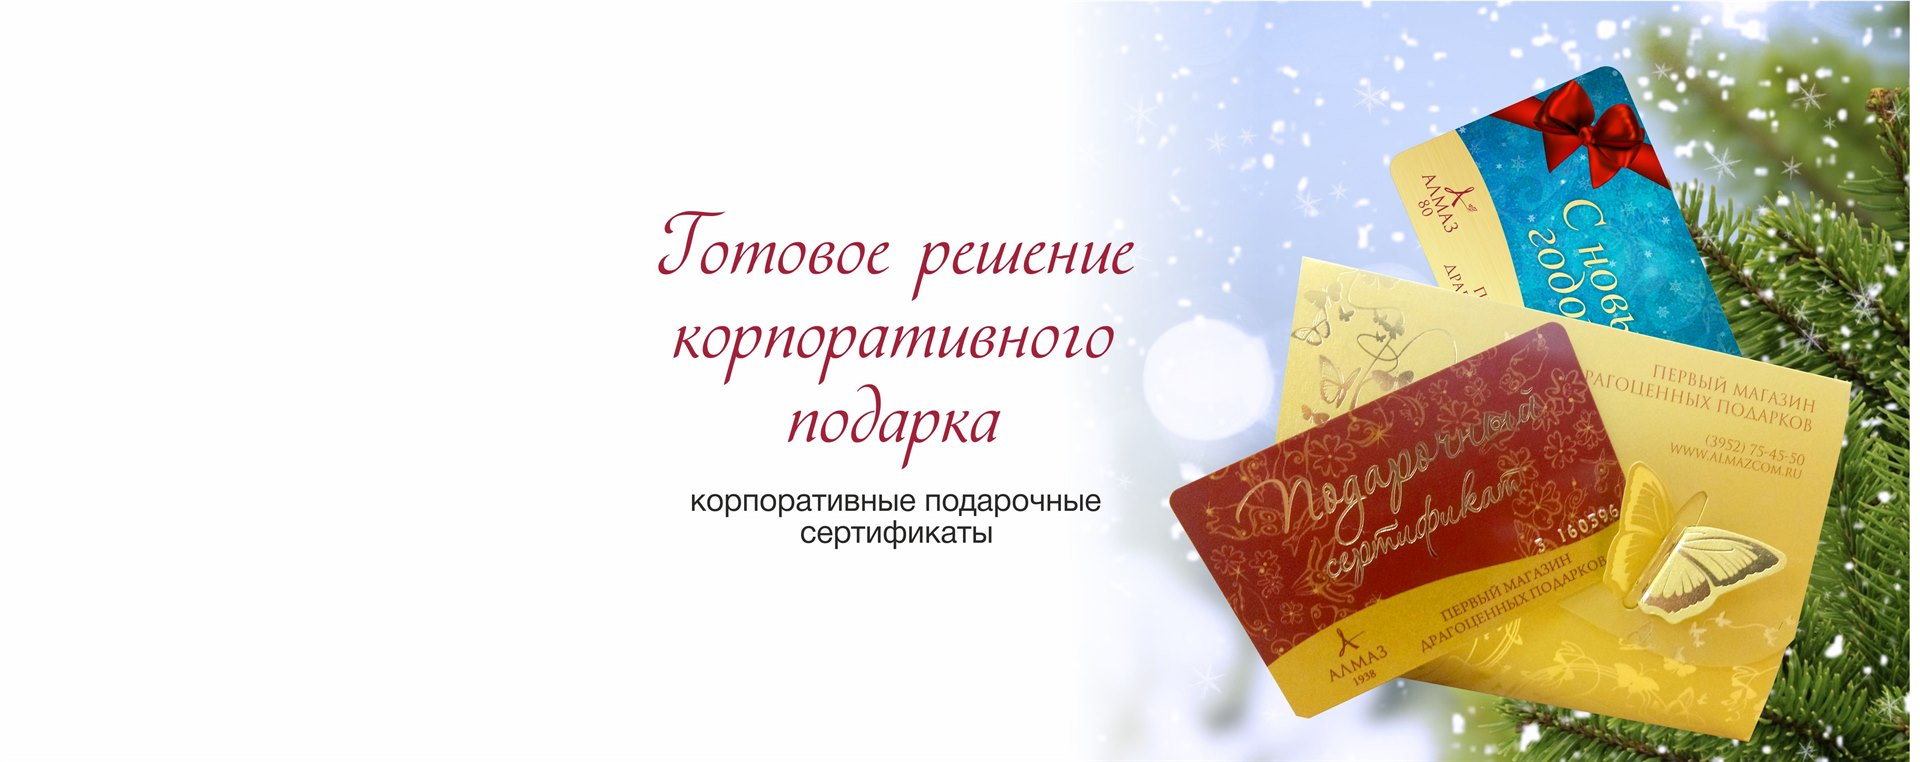 https://www.almazcom.ru/pub/img/Info/24/banner_podarochnye_sertifikaty.jpg